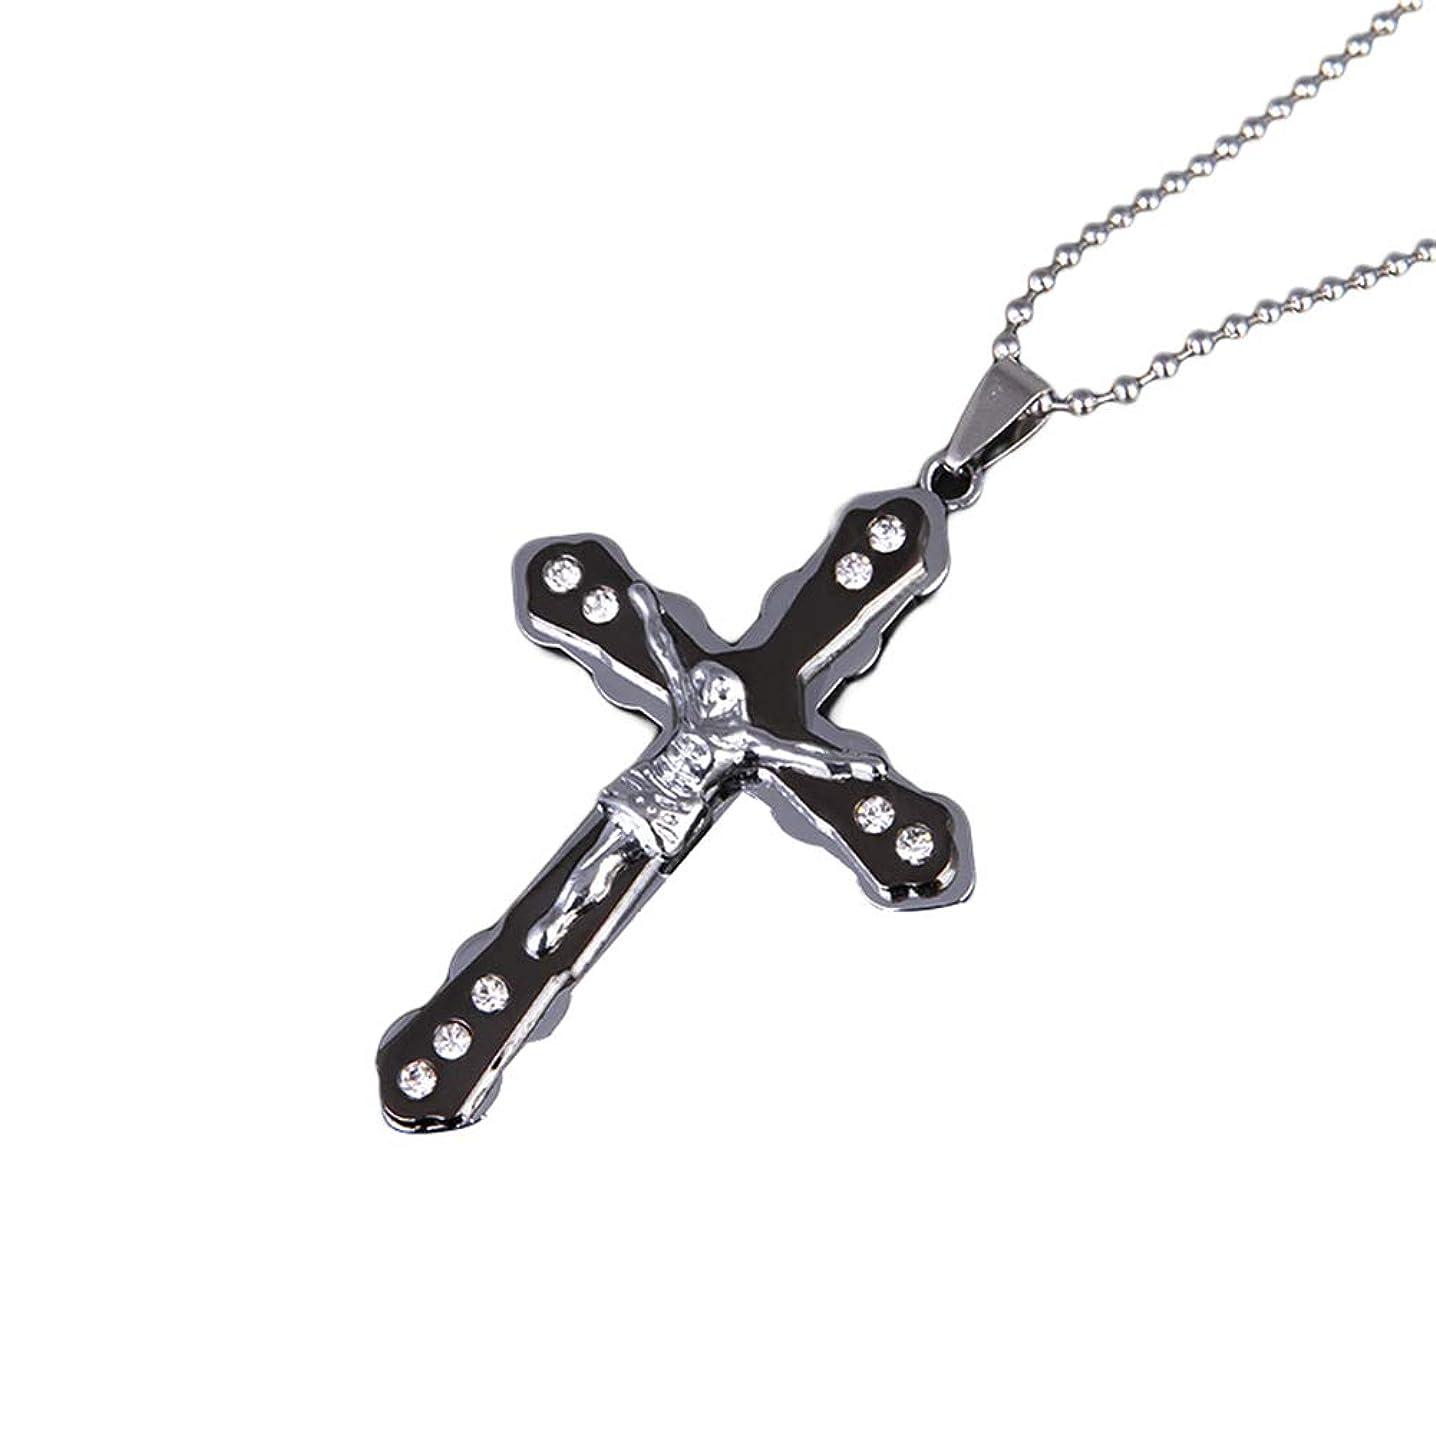 Mrsalontek Men Religious Necklaces, Classic Jesus Cross Rhinestone Inlaid Dangle Metal Chain Faith Neck Jewelry Black